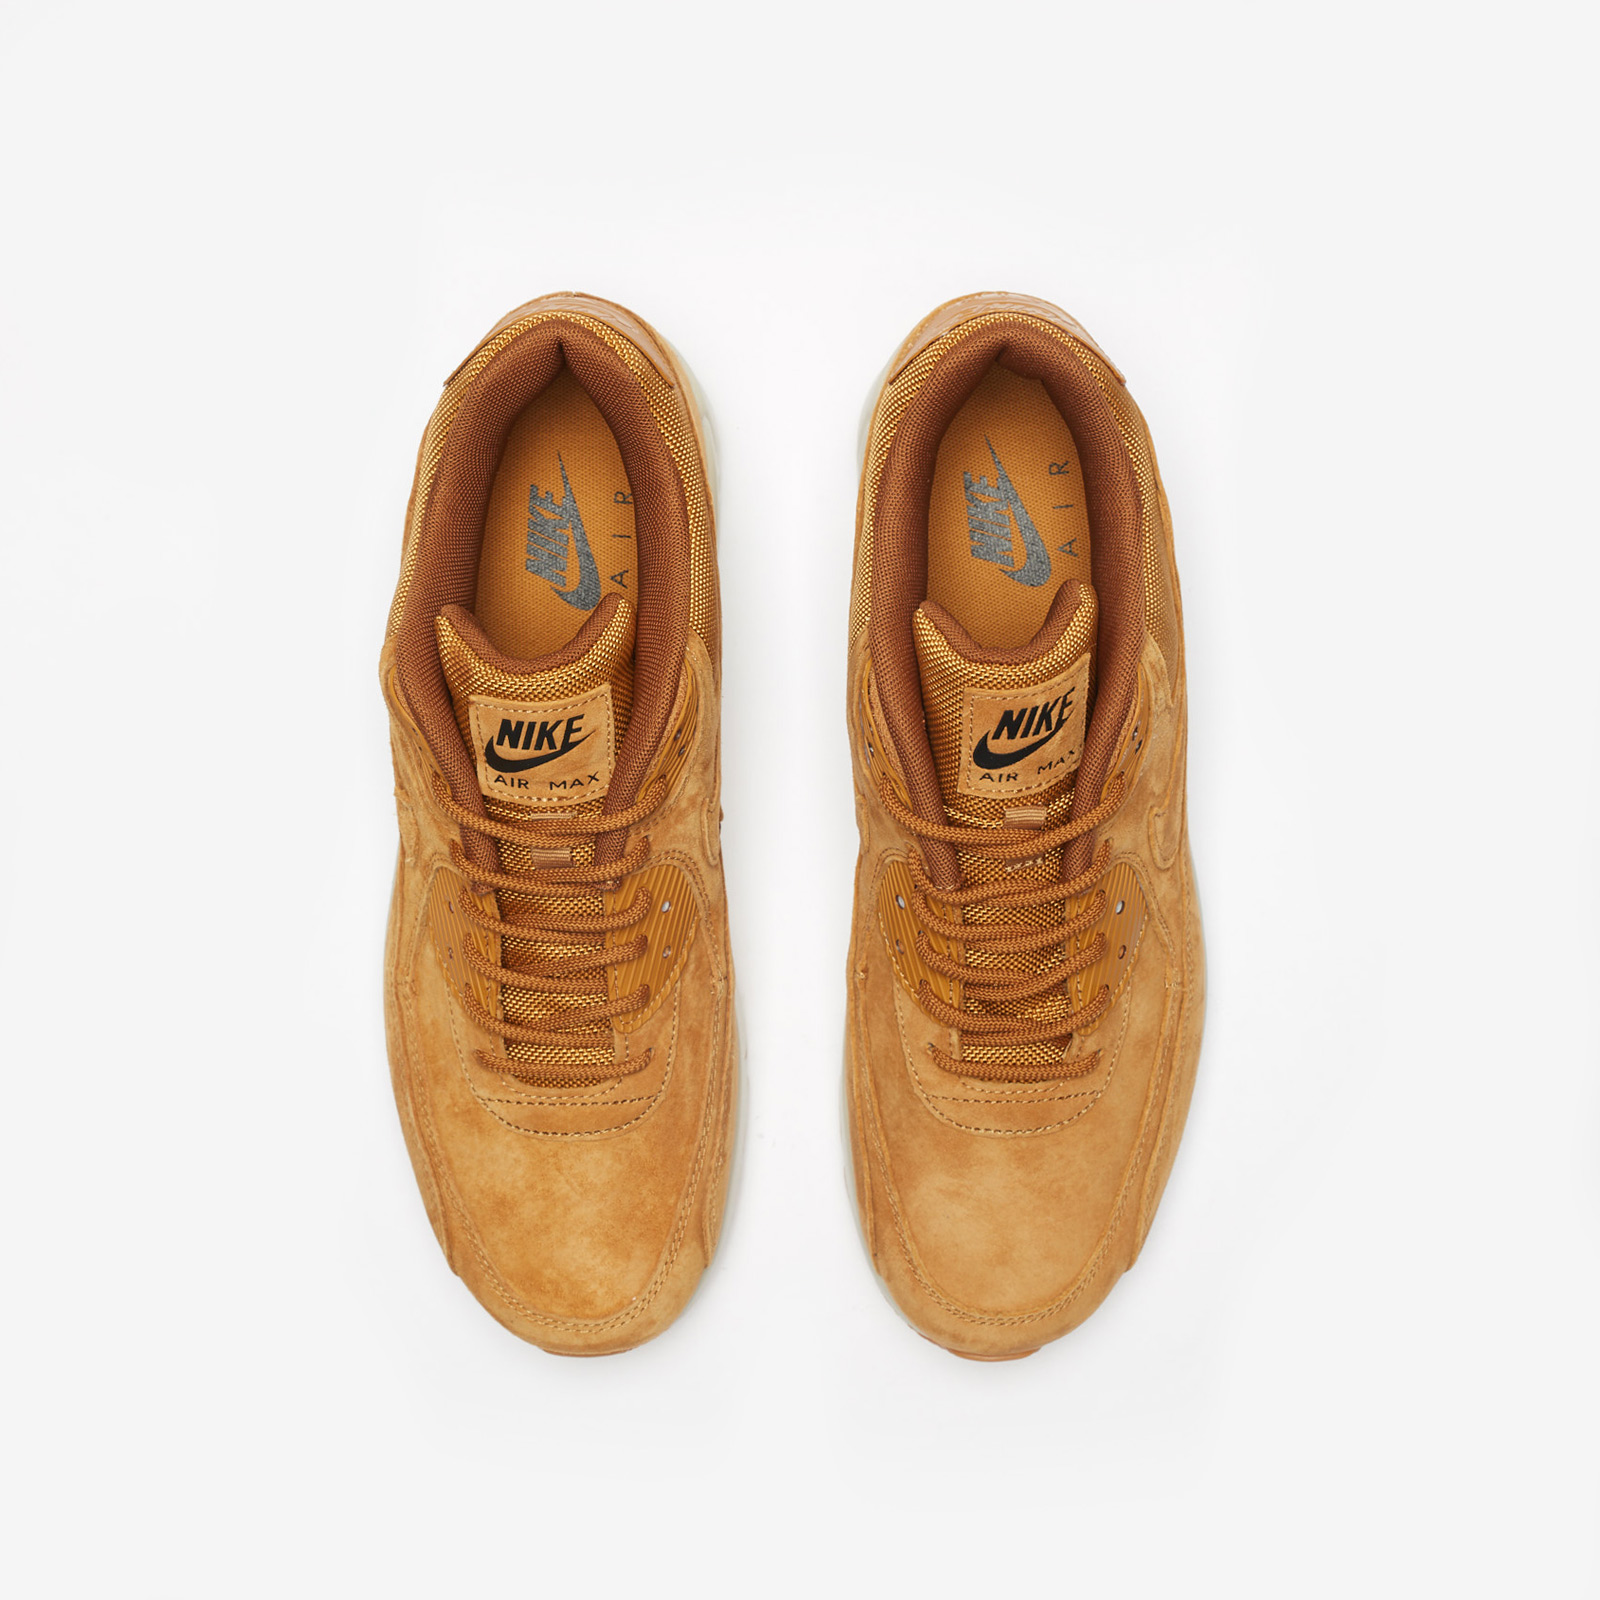 9ce720ba4111 Nike Air Max 90 Ultra 2.0 LTR - 924447-700 - Sneakersnstuff ...